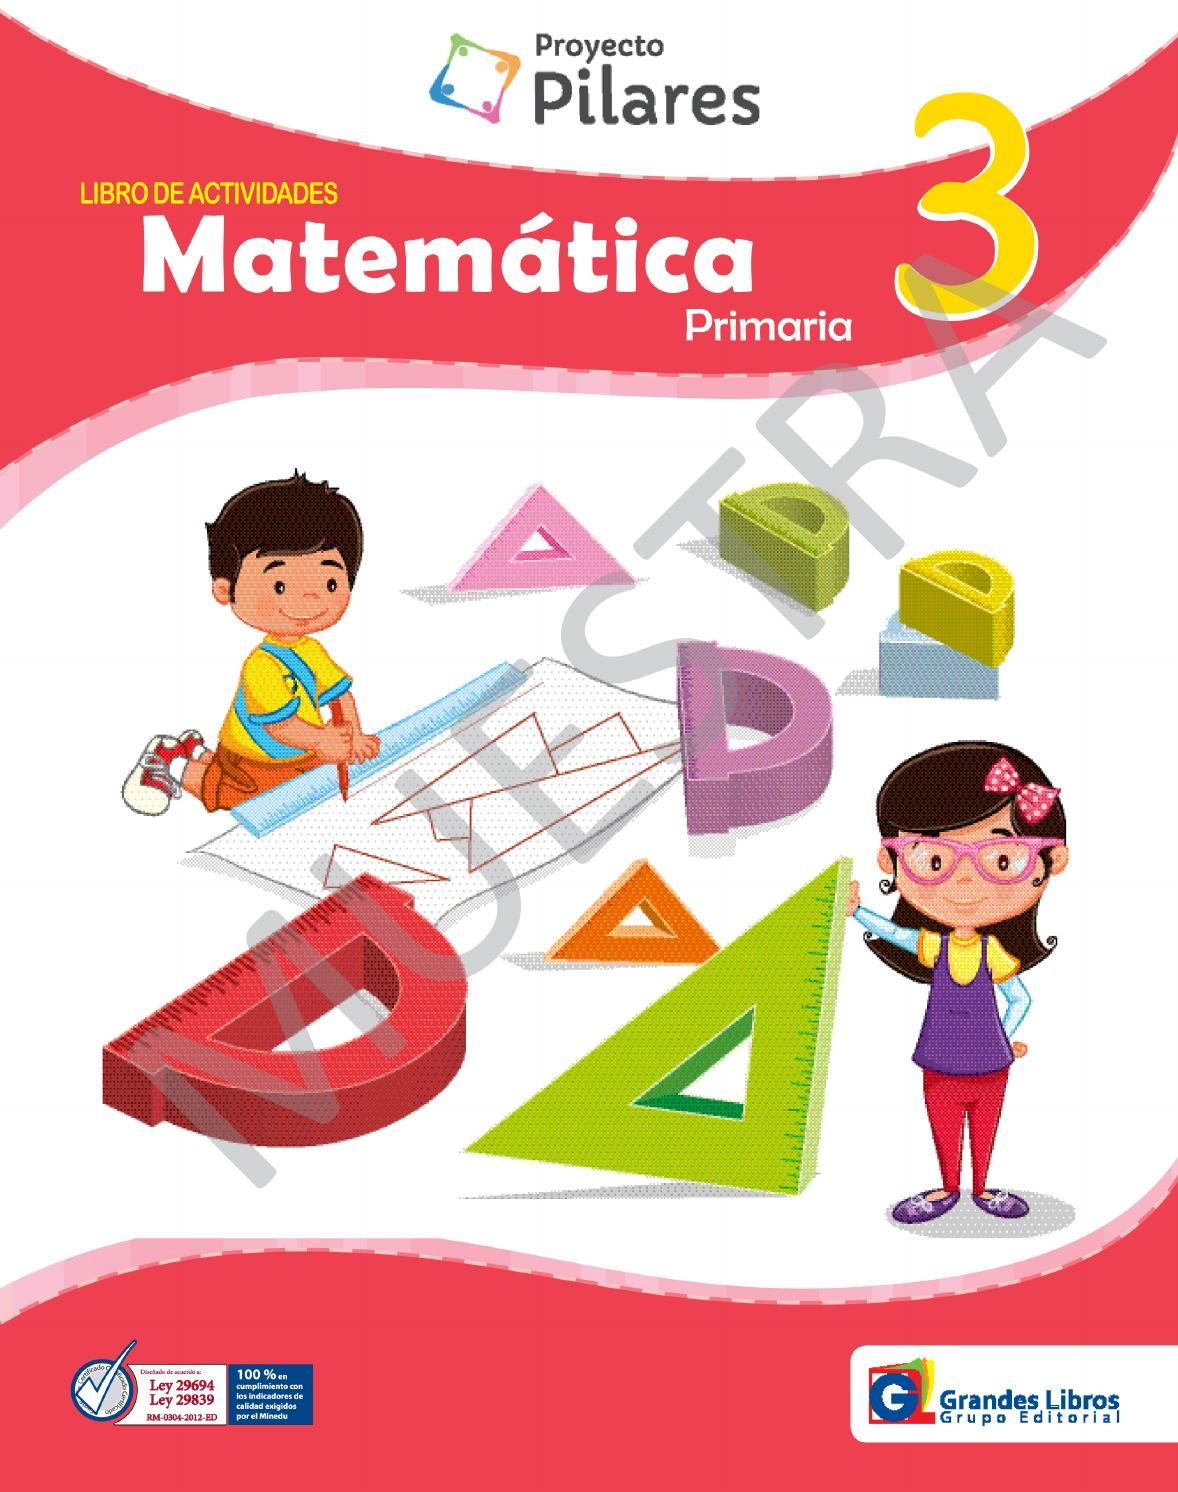 Proyecto Pilares Matematica 3 Libro De Actividades Kids Education Education Acting